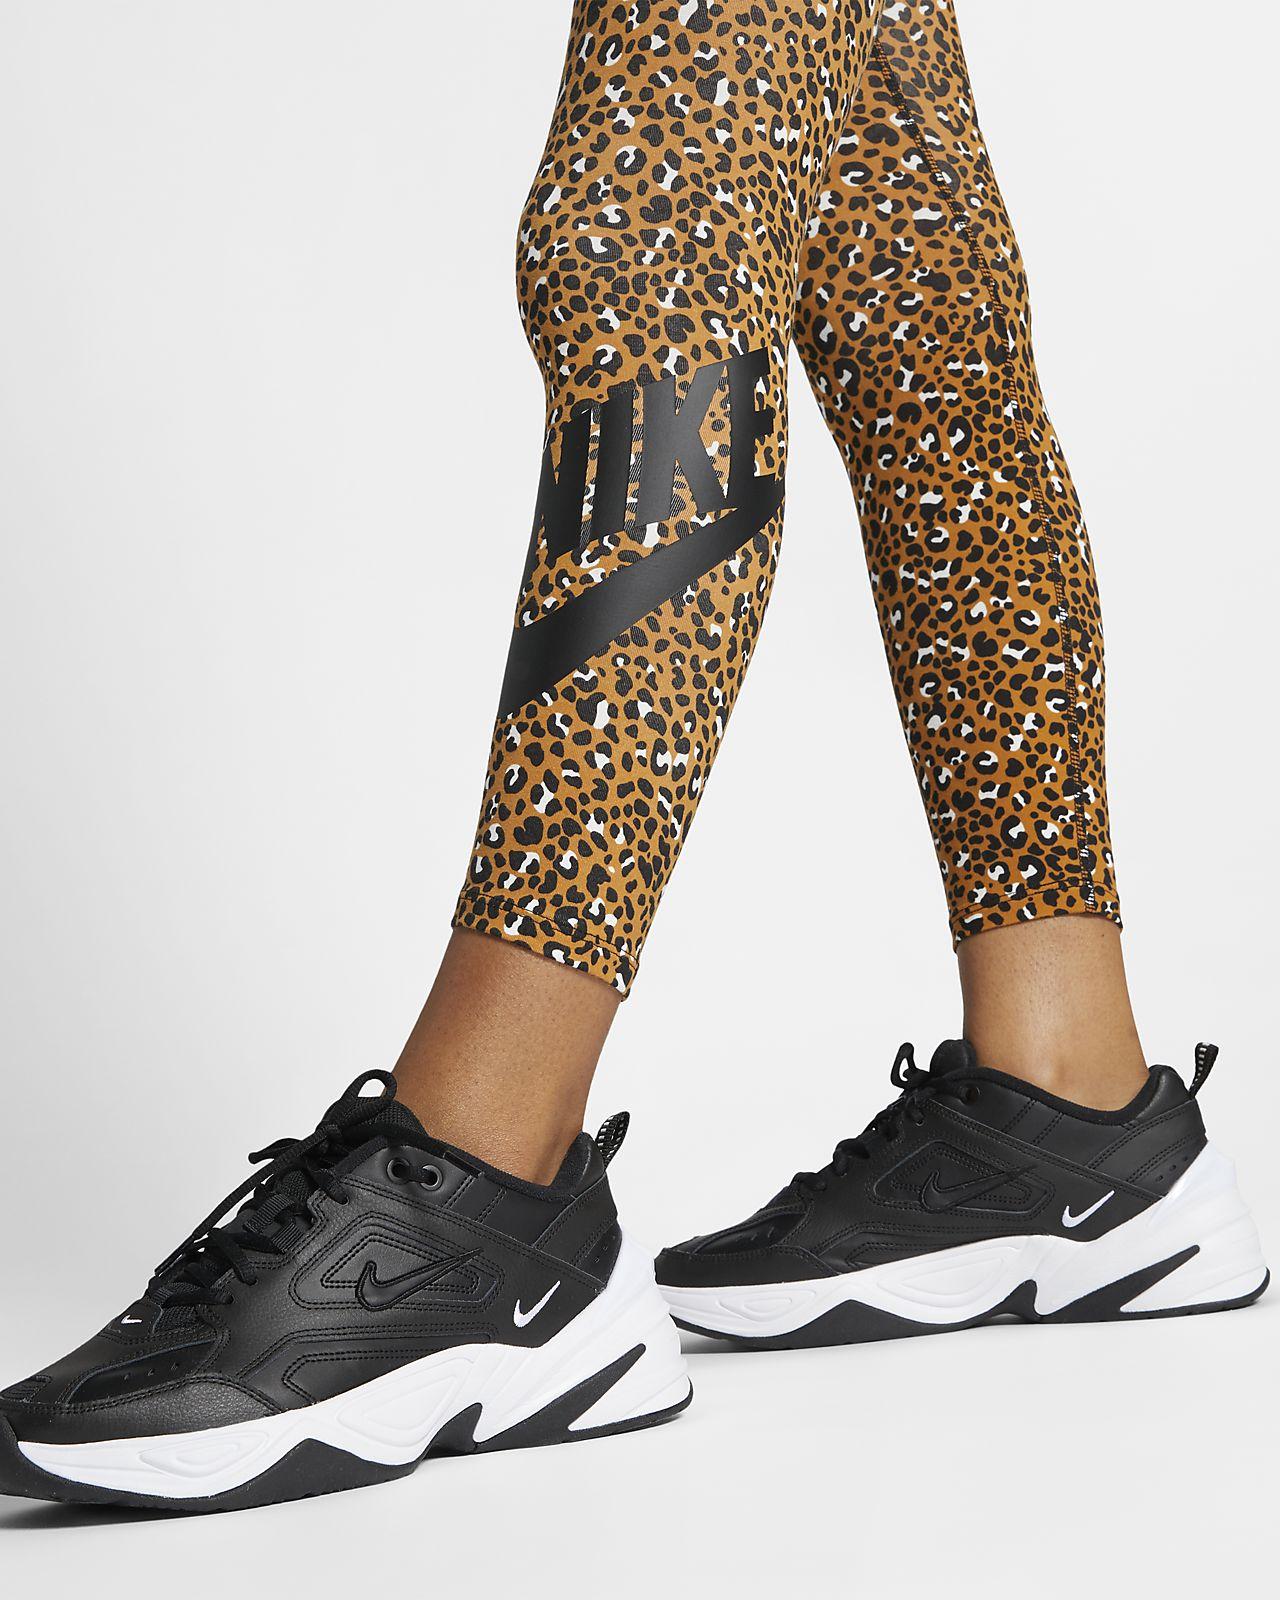 f59ce448ca3 Nike Sportswear Animal Print Women s Leggings. Nike.com ZA